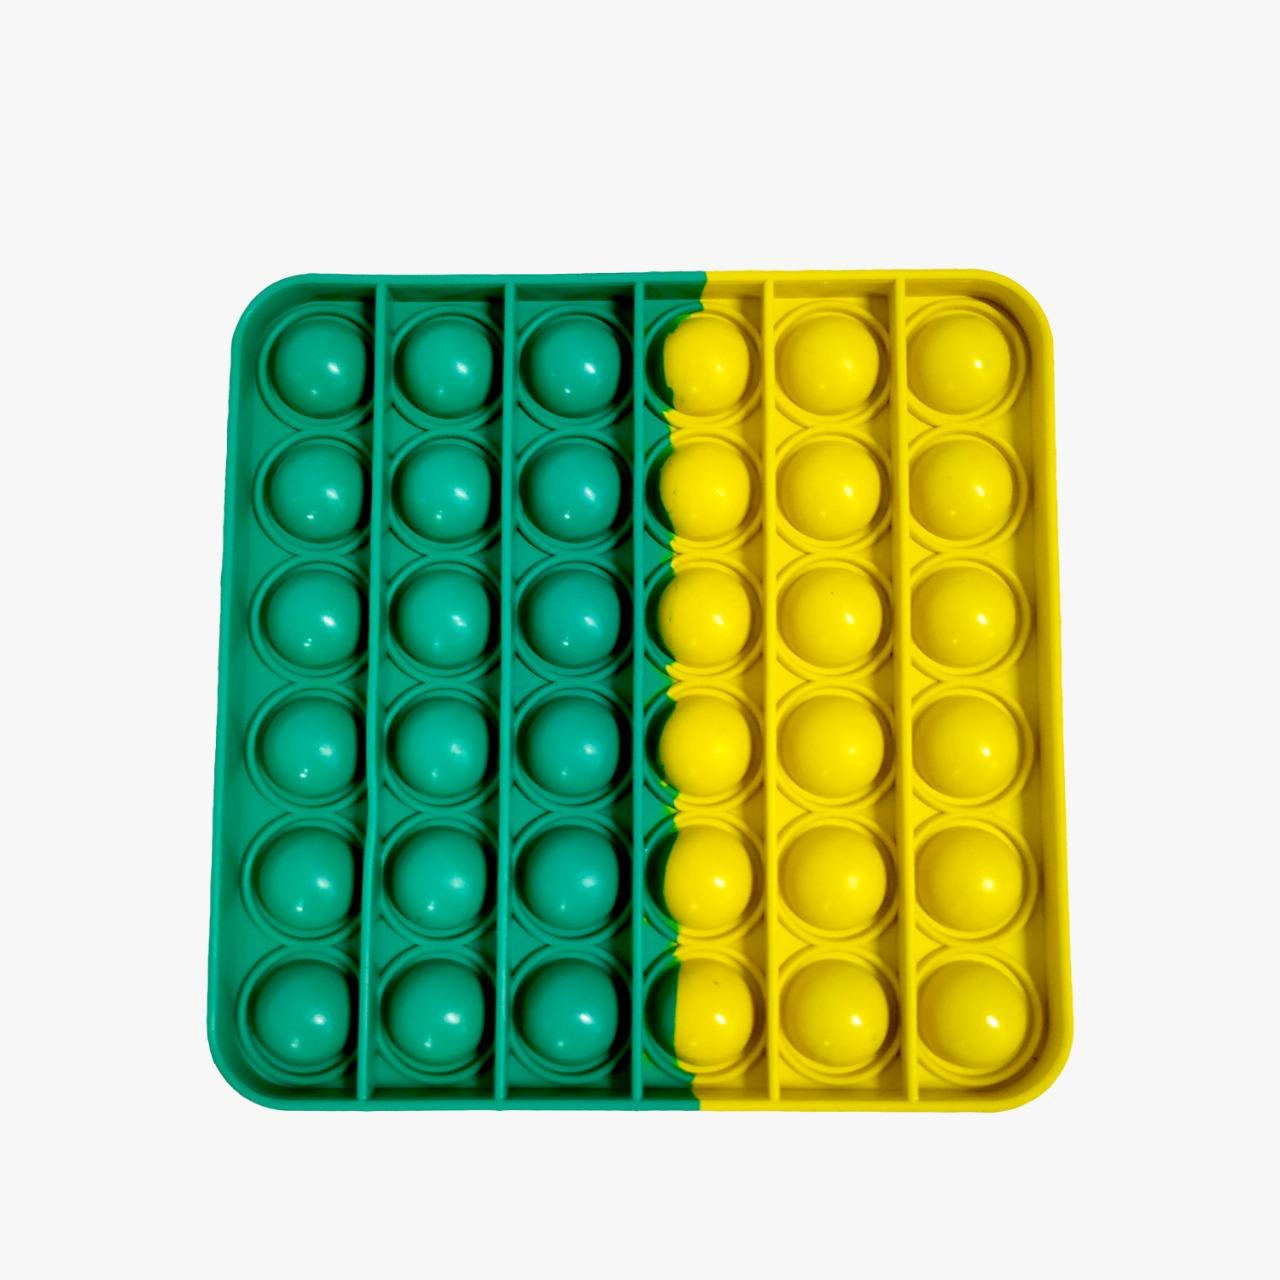 Brinquedo Pop-it Fidget Toys Quadrado